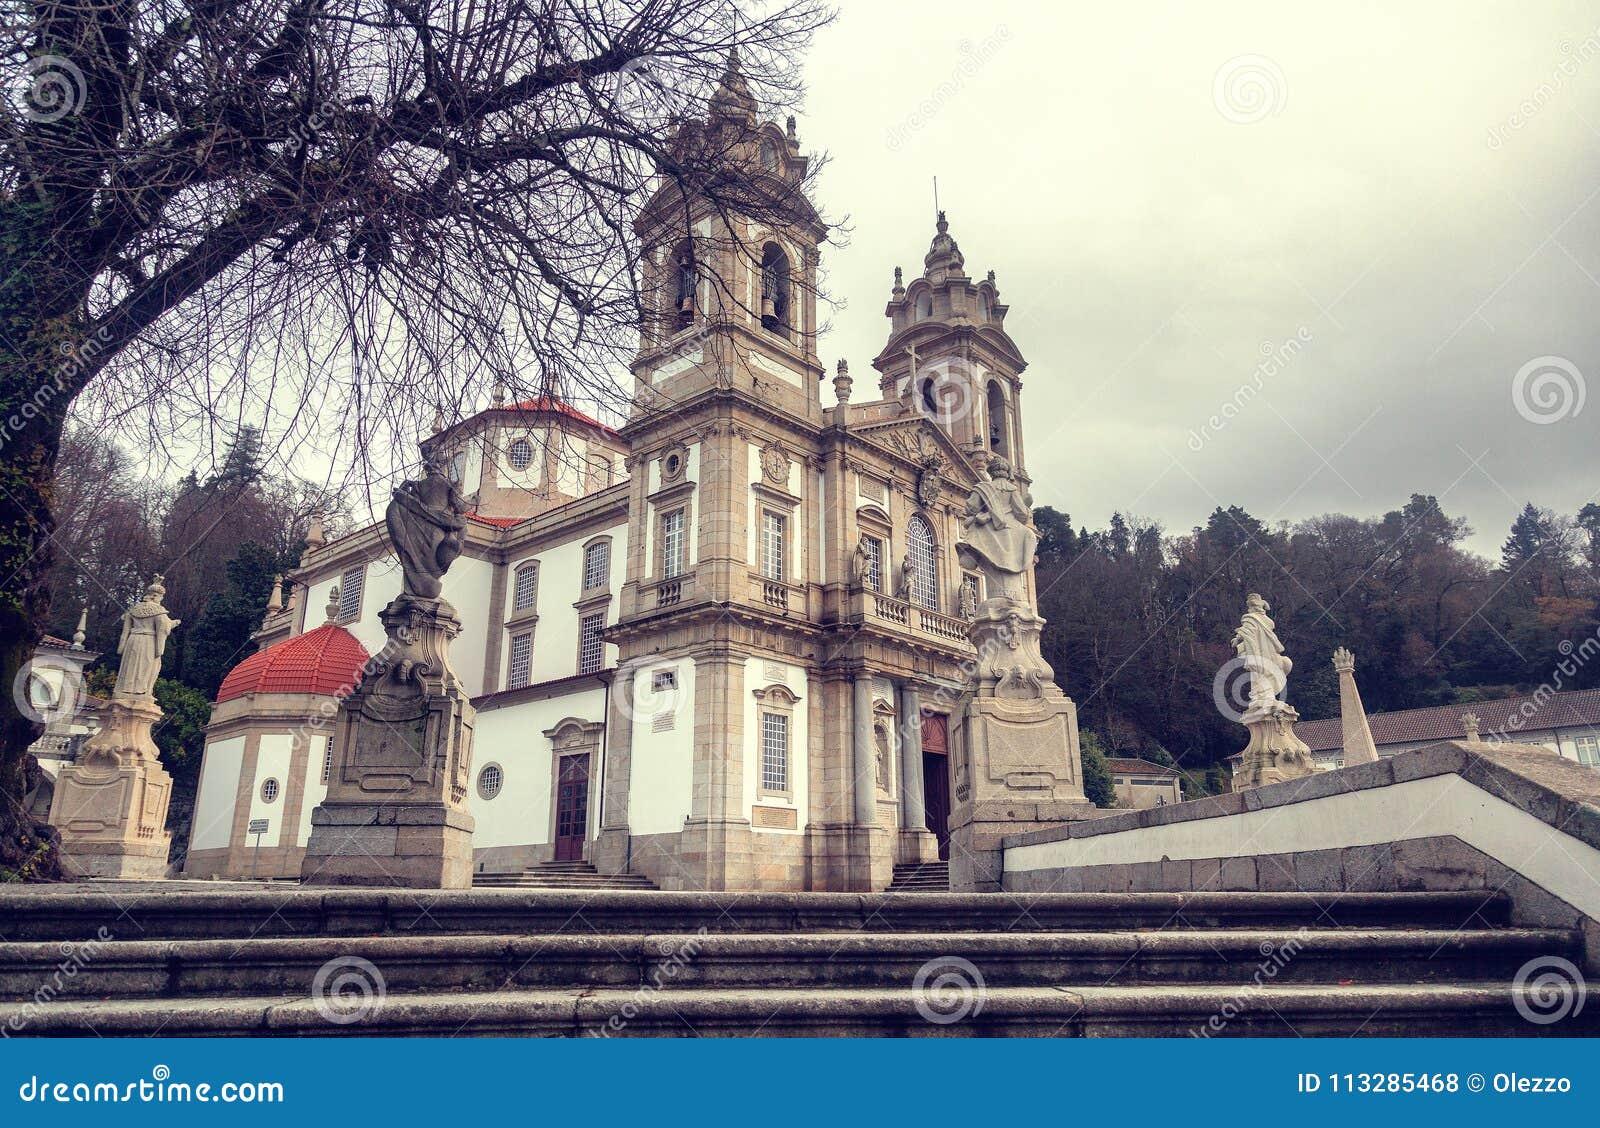 Sanctuary of Bom Jesus do Monte. Popular landmark and pilgrimage